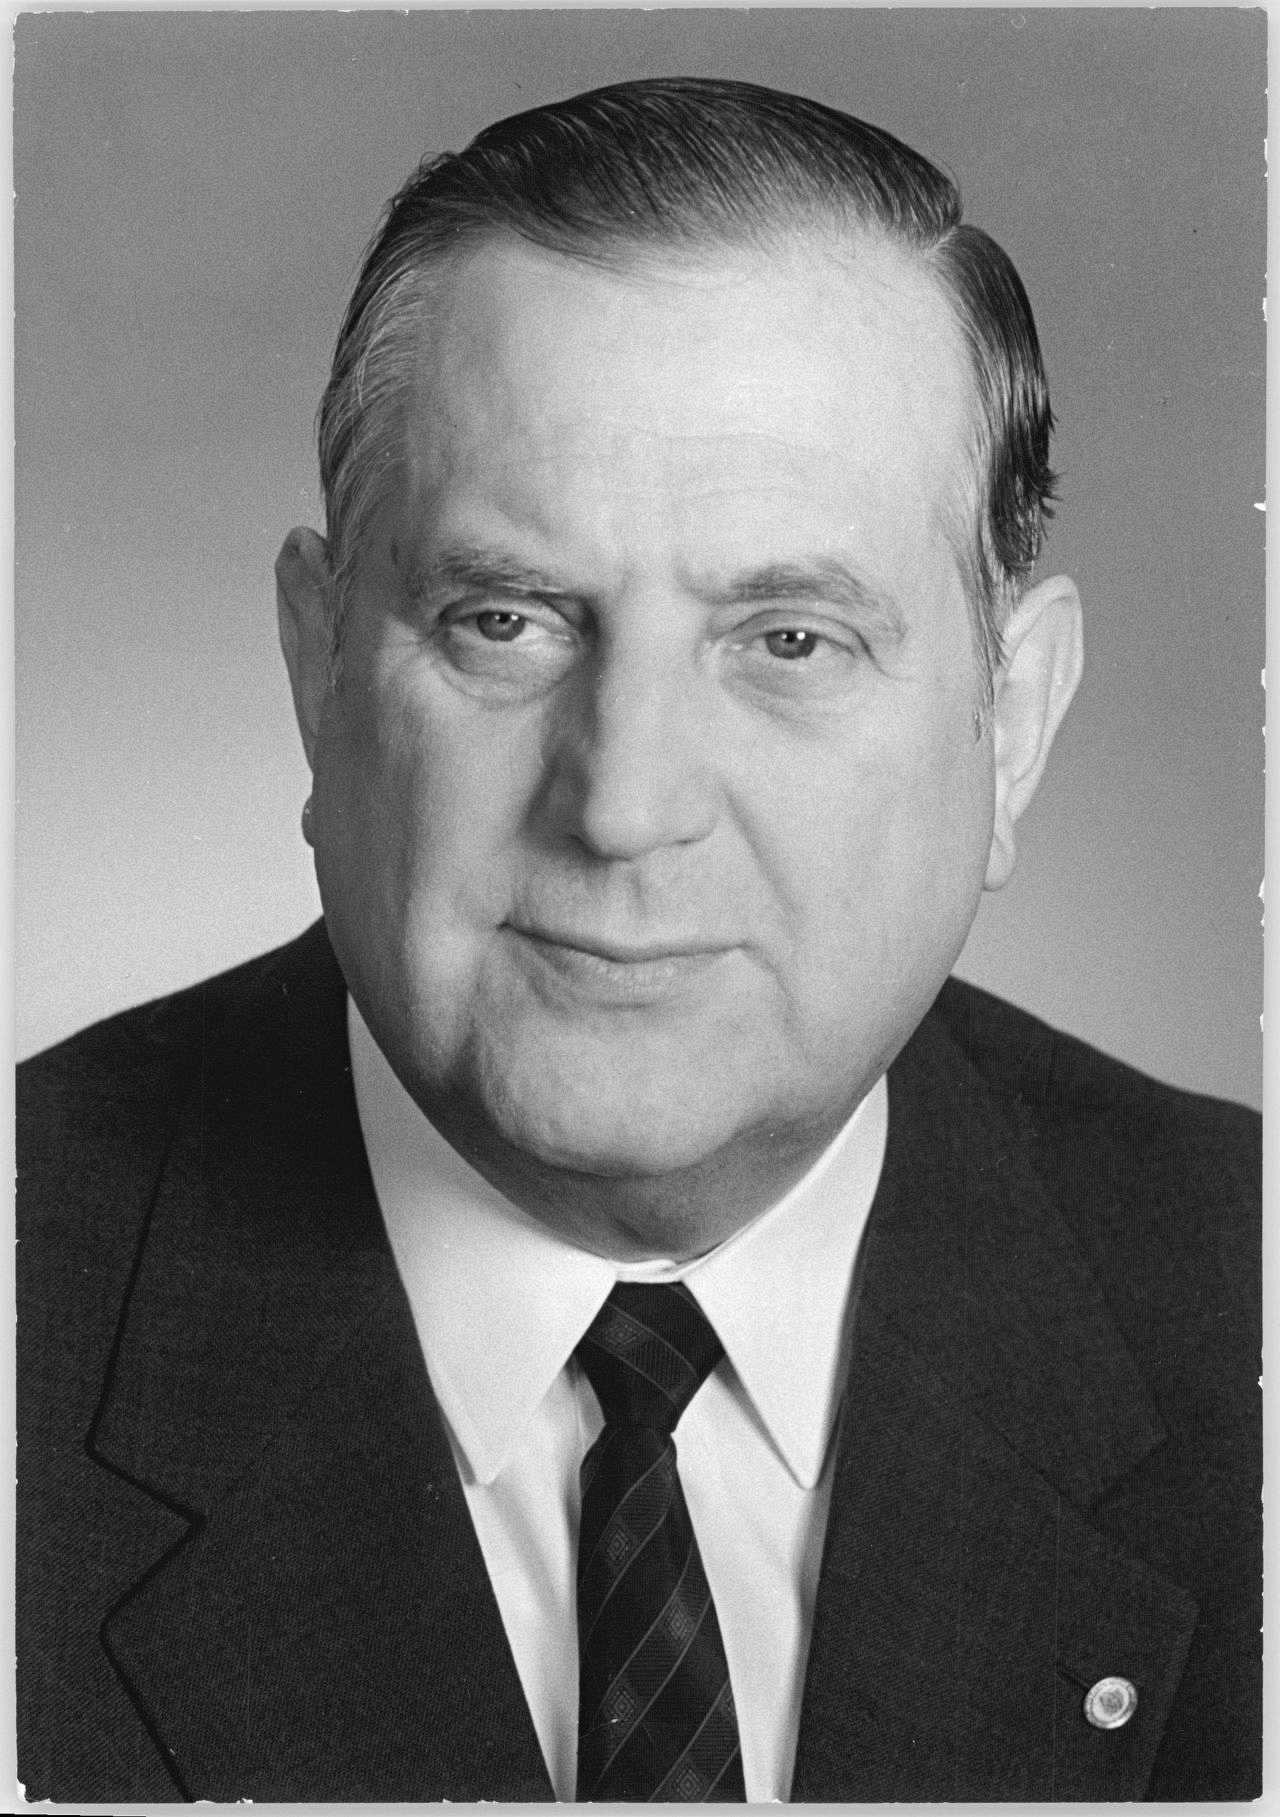 biografie alexander schalck golodkowski - Wolfgang Borchert Lebenslauf